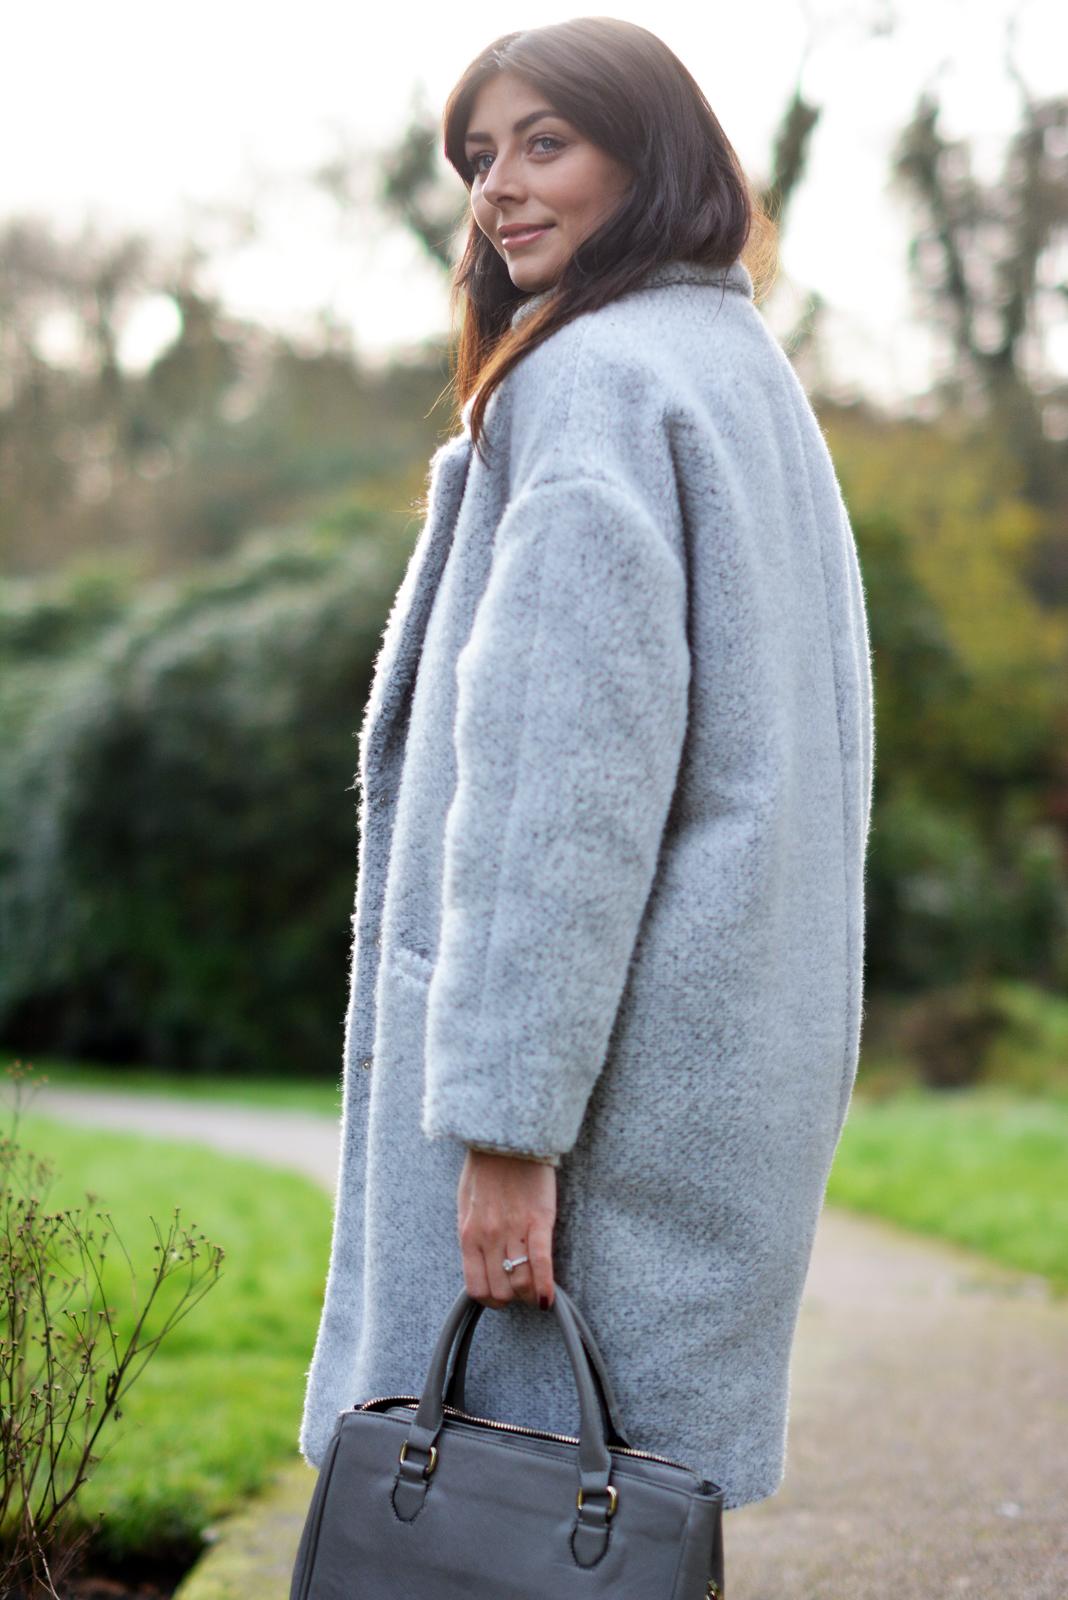 EJSTYLE - winter whites OOTD, grey primark coat teddy